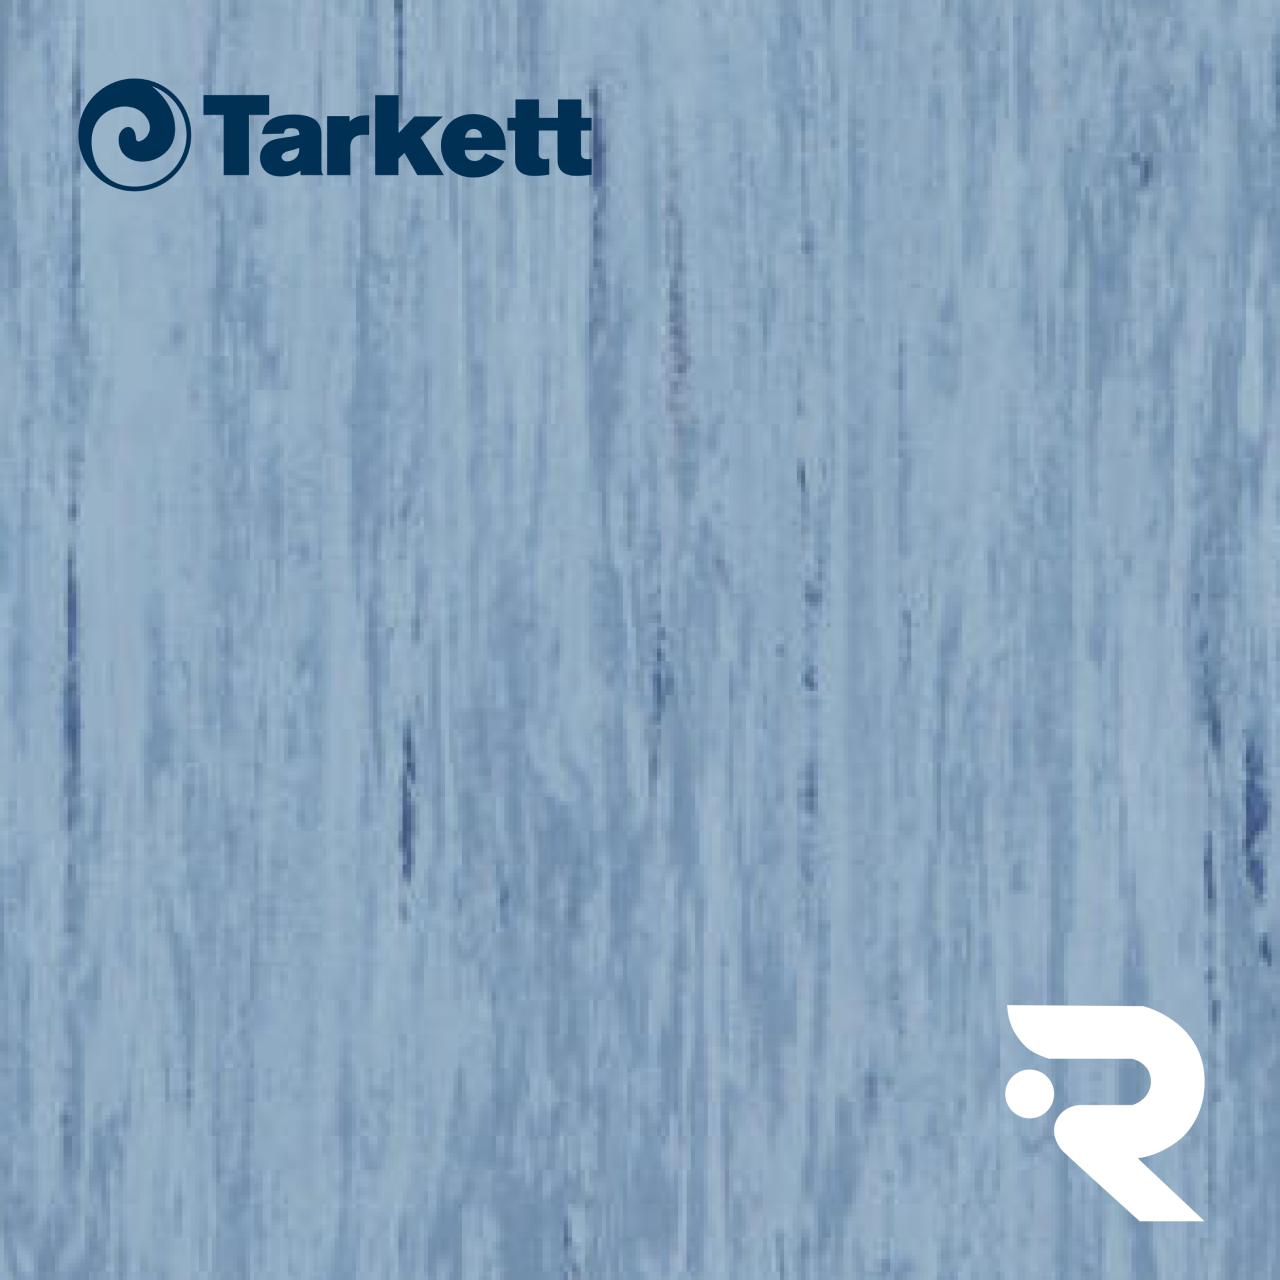 🏫 Гомогенний лінолеум Tarkett | Standard MEDIUM BLUE 0492 | Standard Plus 2.0 mm | 610 х 610 мм